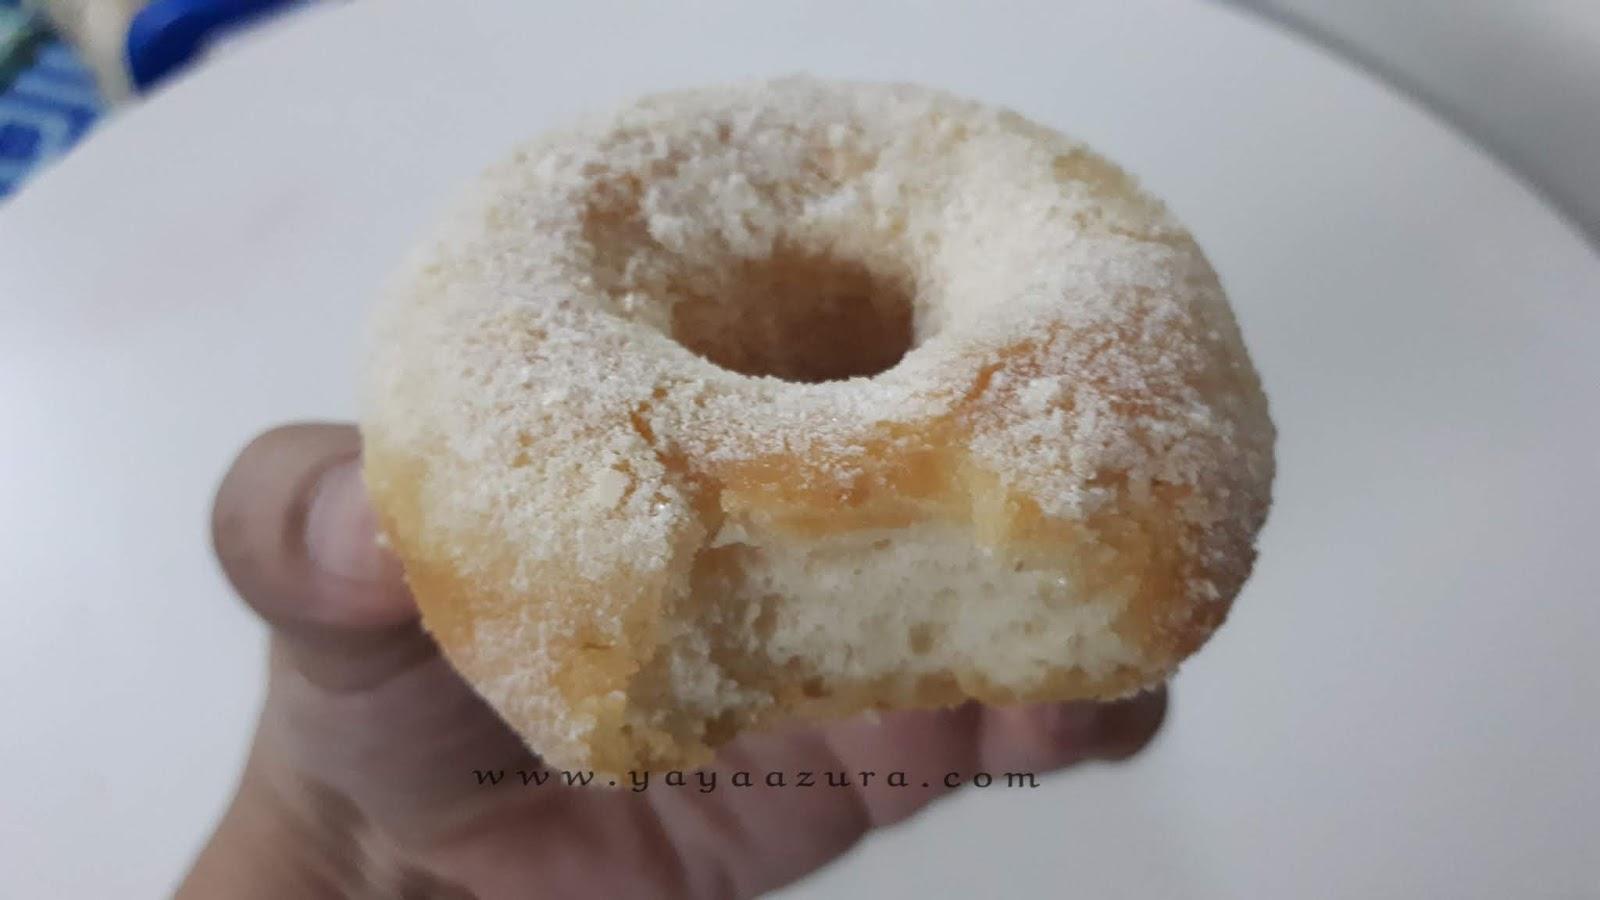 Resepi Donut Tanpa Majerin - Roadto10ksubscribers 1kg tepung gandum 2 cawan air suam 8 sudu gula